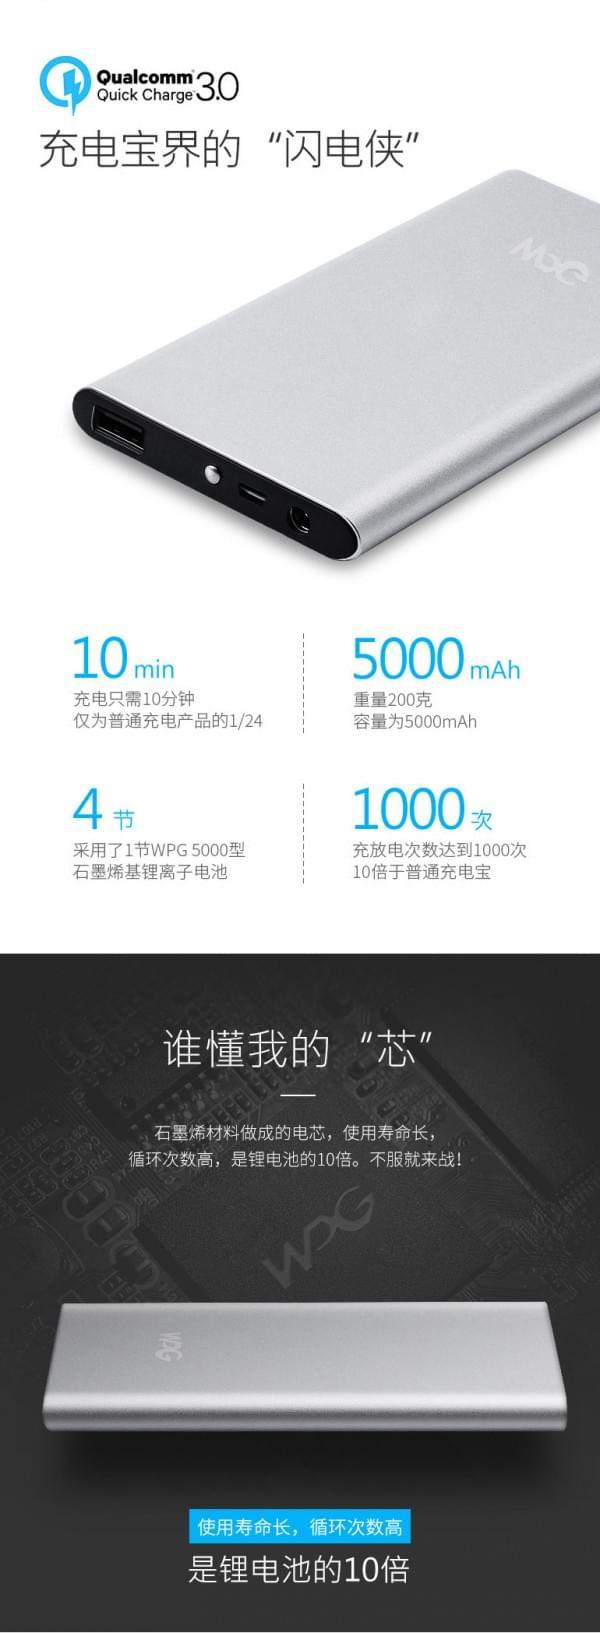 WPG石墨烯移动电源众筹:10分钟充满5000mAh 绝无王炸的照片 - 3